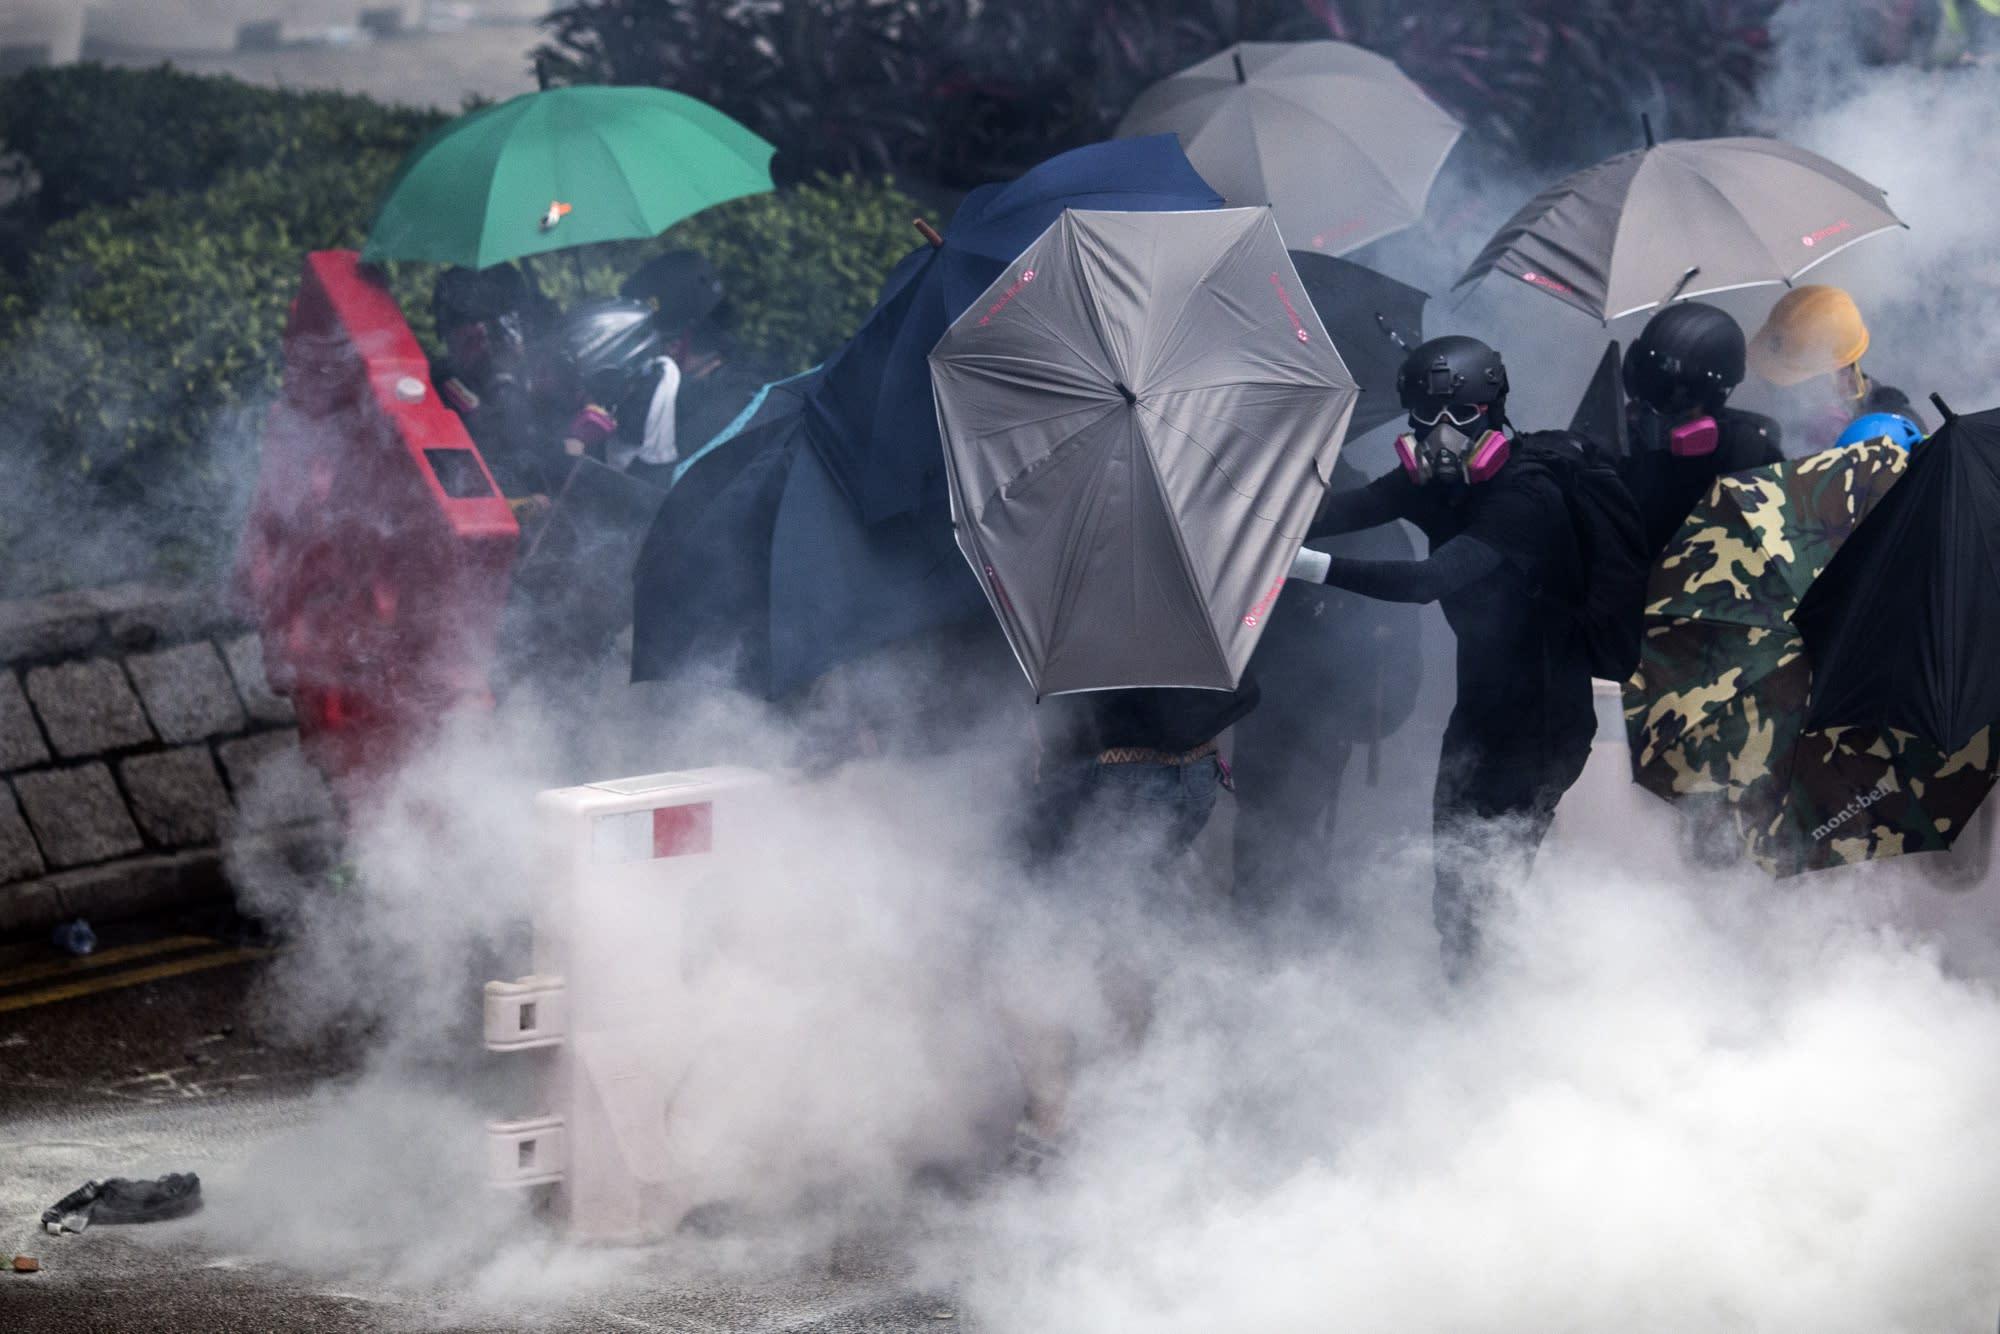 Hong Kong Police Ban Mass March After Subway Station Fire